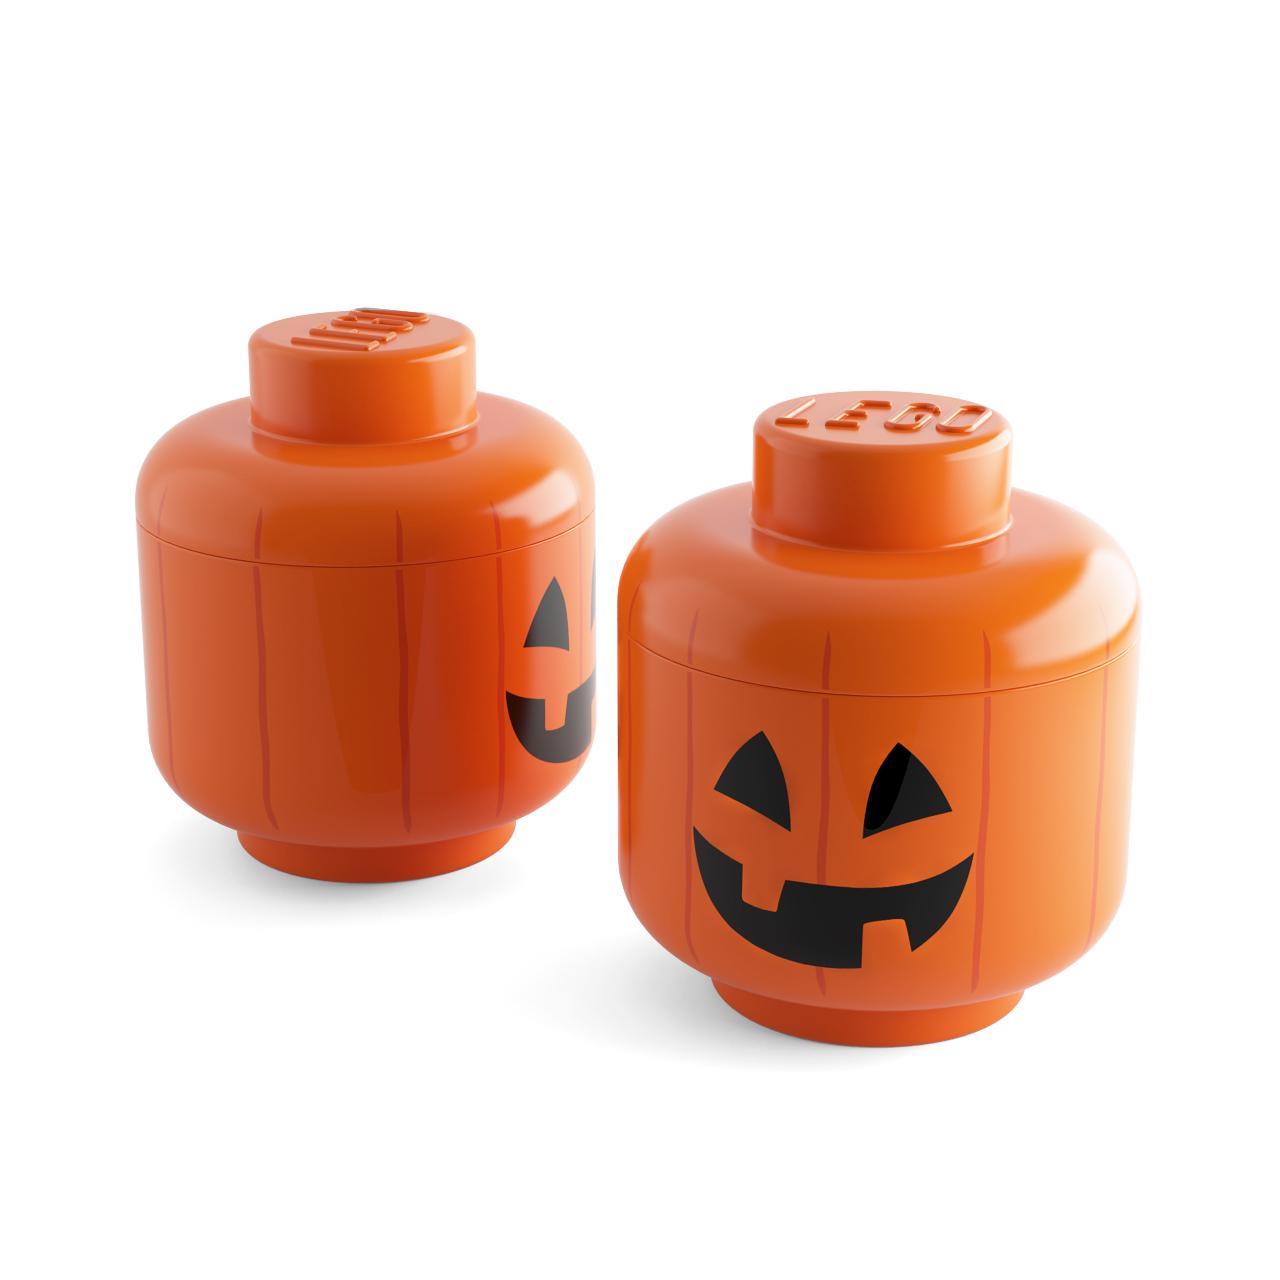 Pumpkin Storage Head by Lego